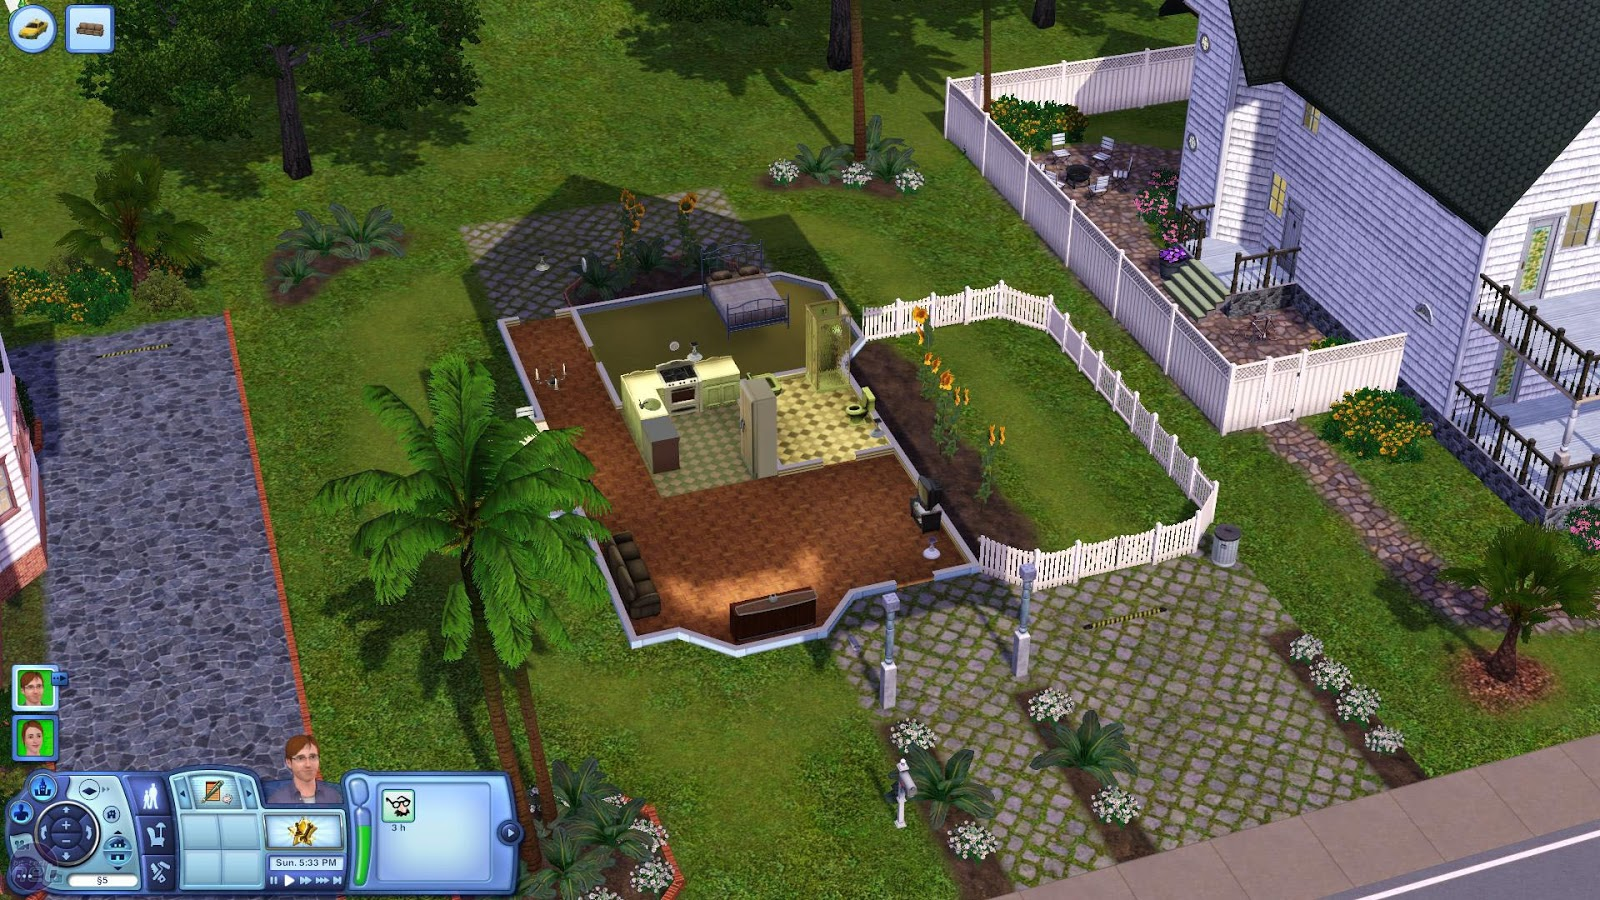 Sims 3 Жизнь Hd На Андроид